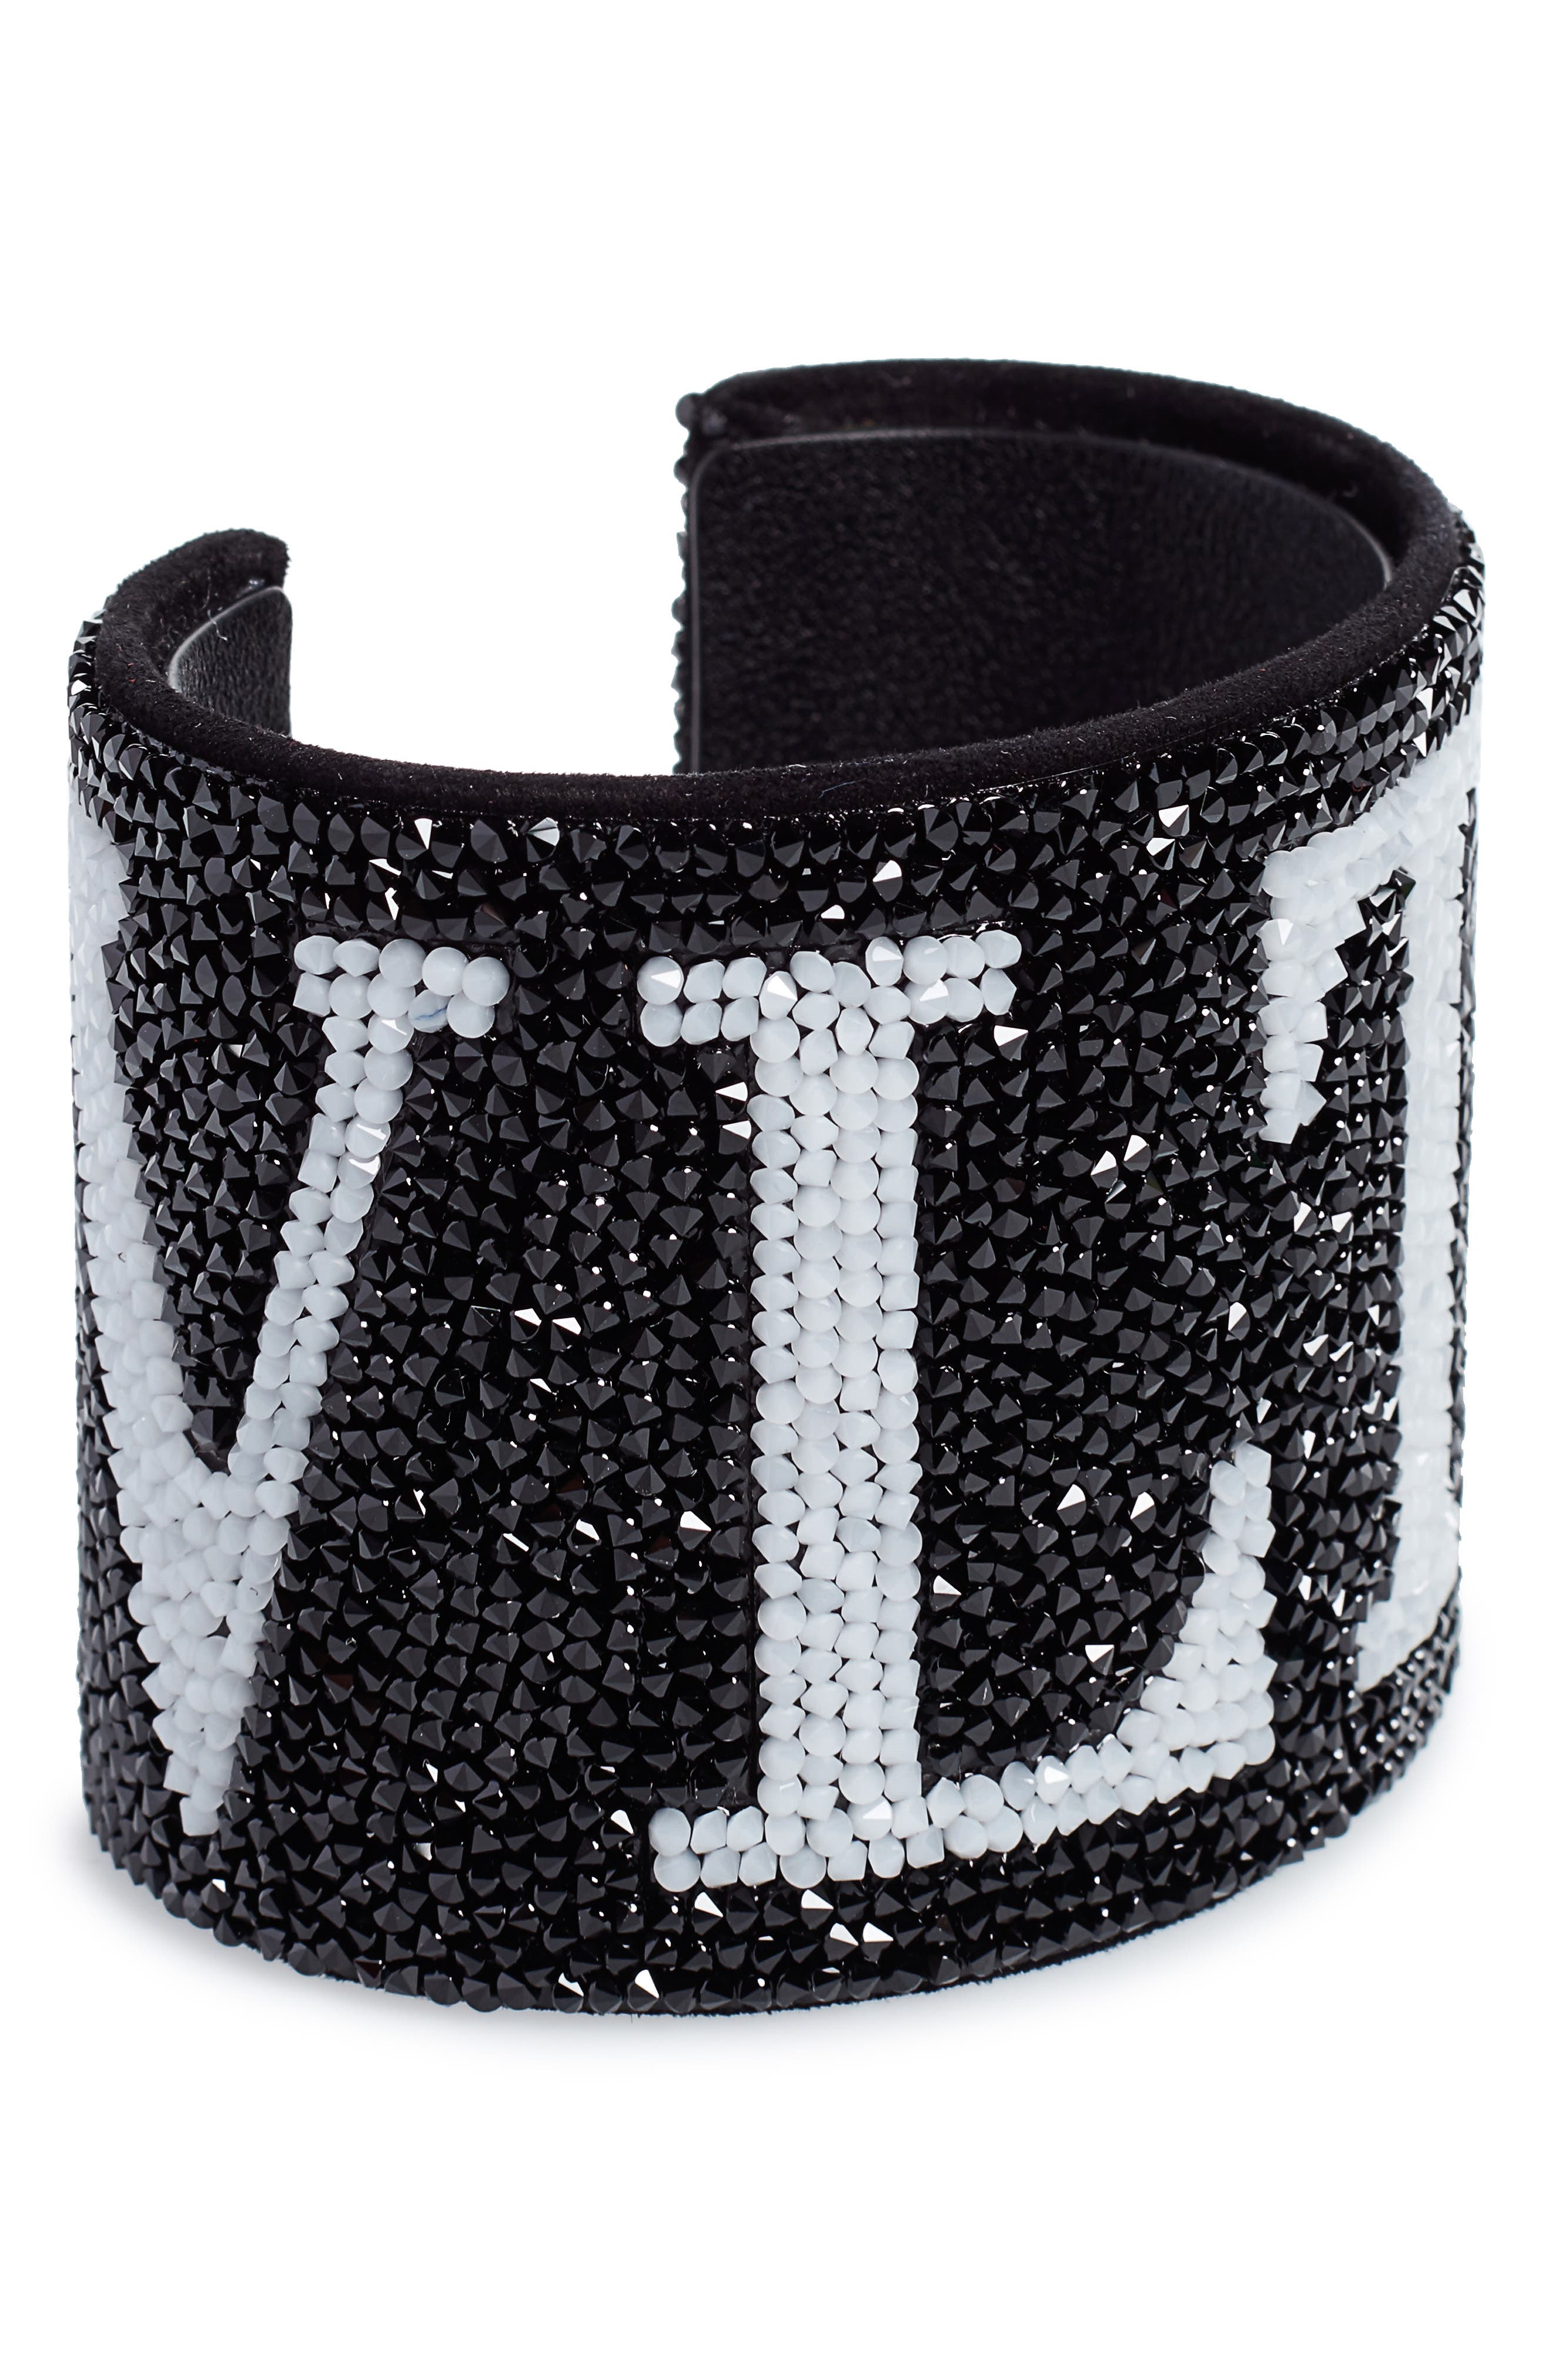 VLTN Cuff Bracelet,                         Main,                         color, NERO